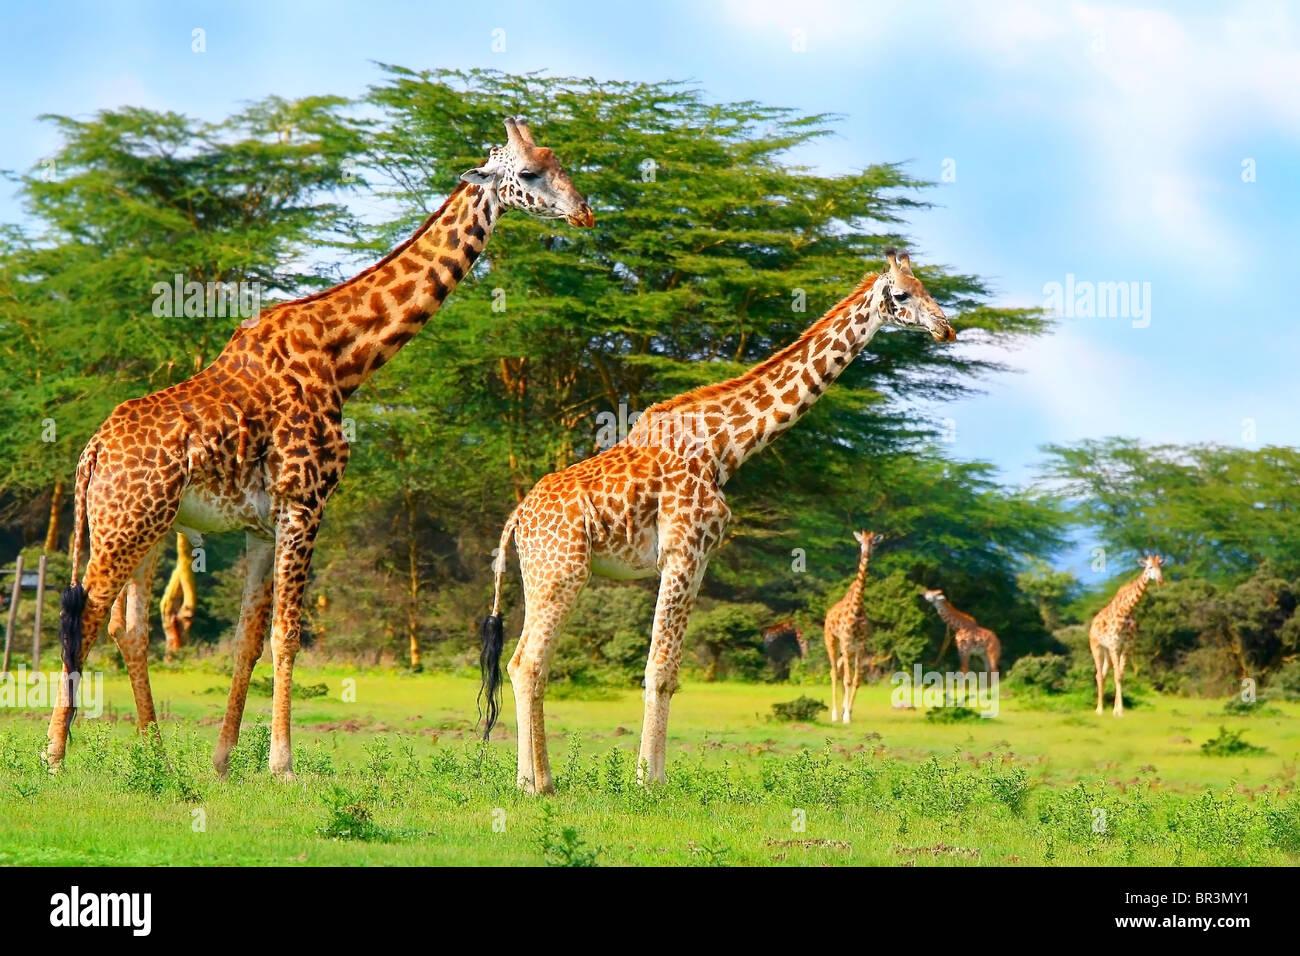 Family of wild giraffes on the lake Naivasha. Africa. Kenya - Stock Image